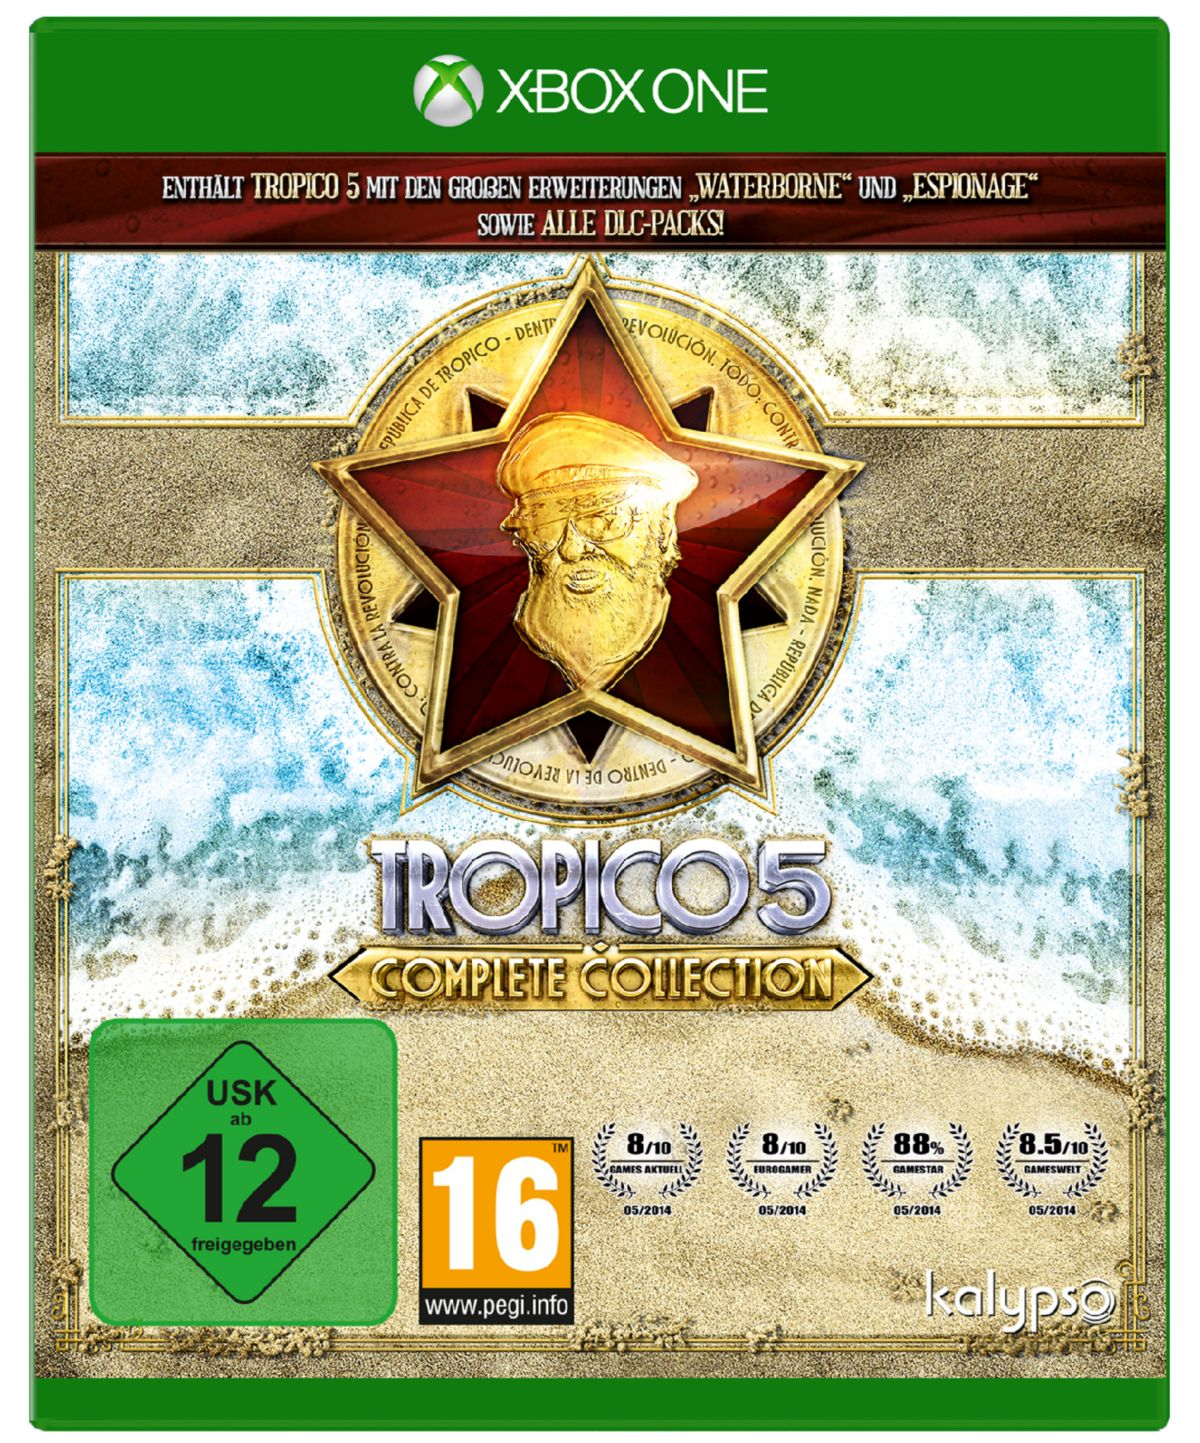 Kalypso Tropico 5 Complete Collection »XBox One«